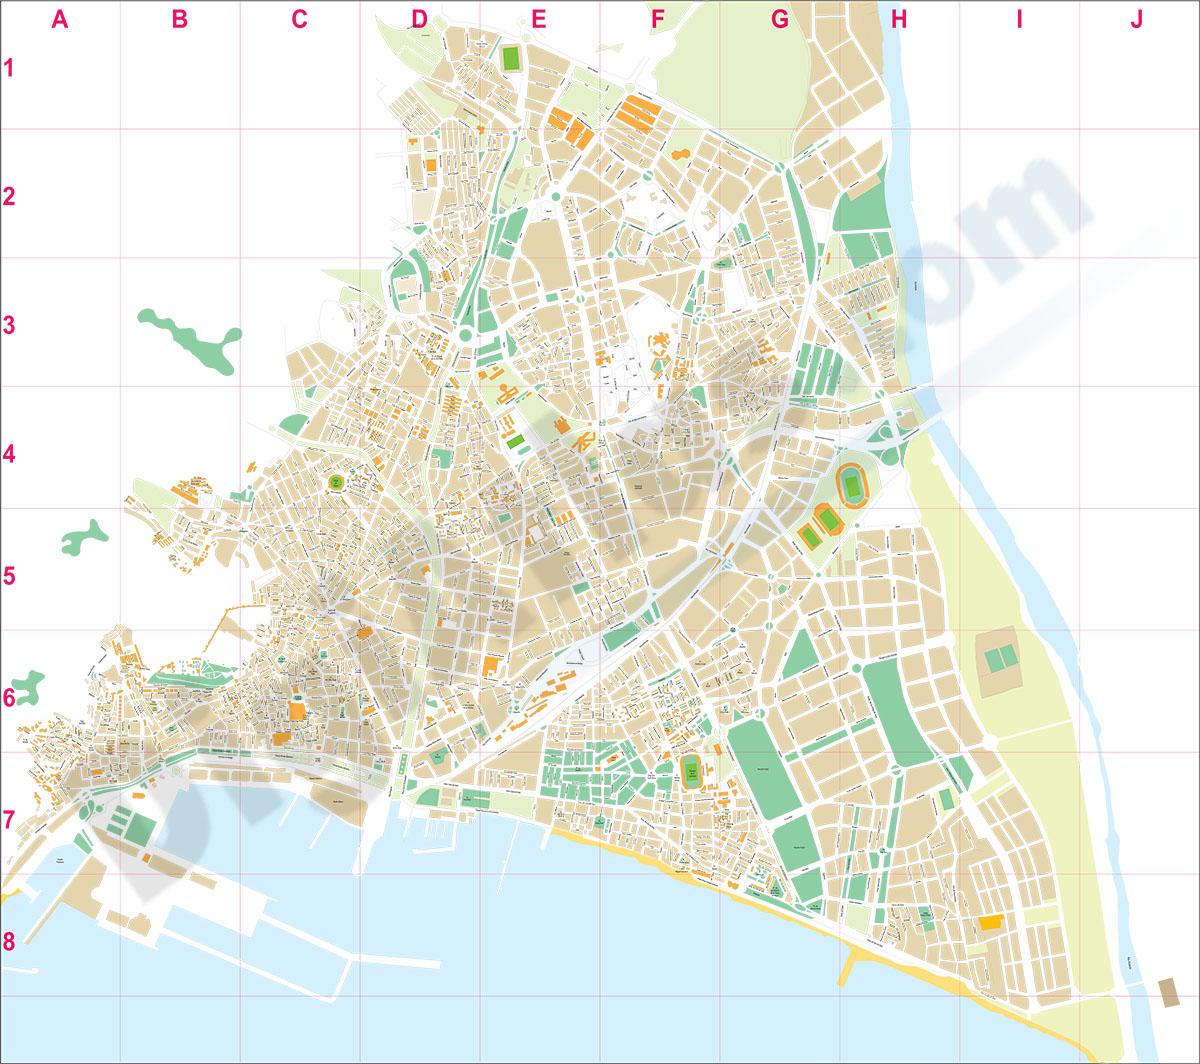 Almeria city map